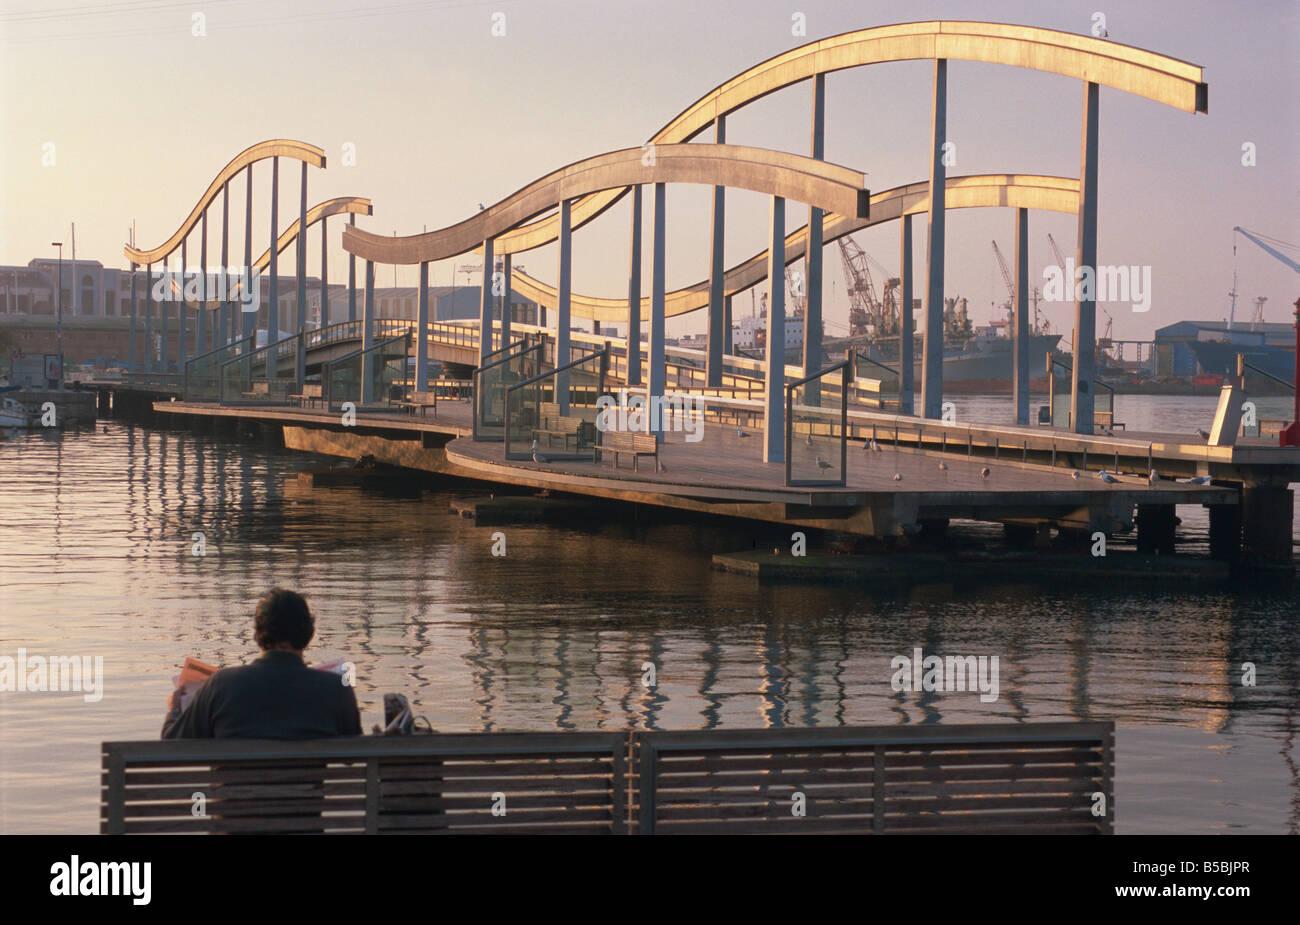 Rambla de Mar, swing bridge, Port Vell, Barcelona, Catalonia, Spain, Europe - Stock Image